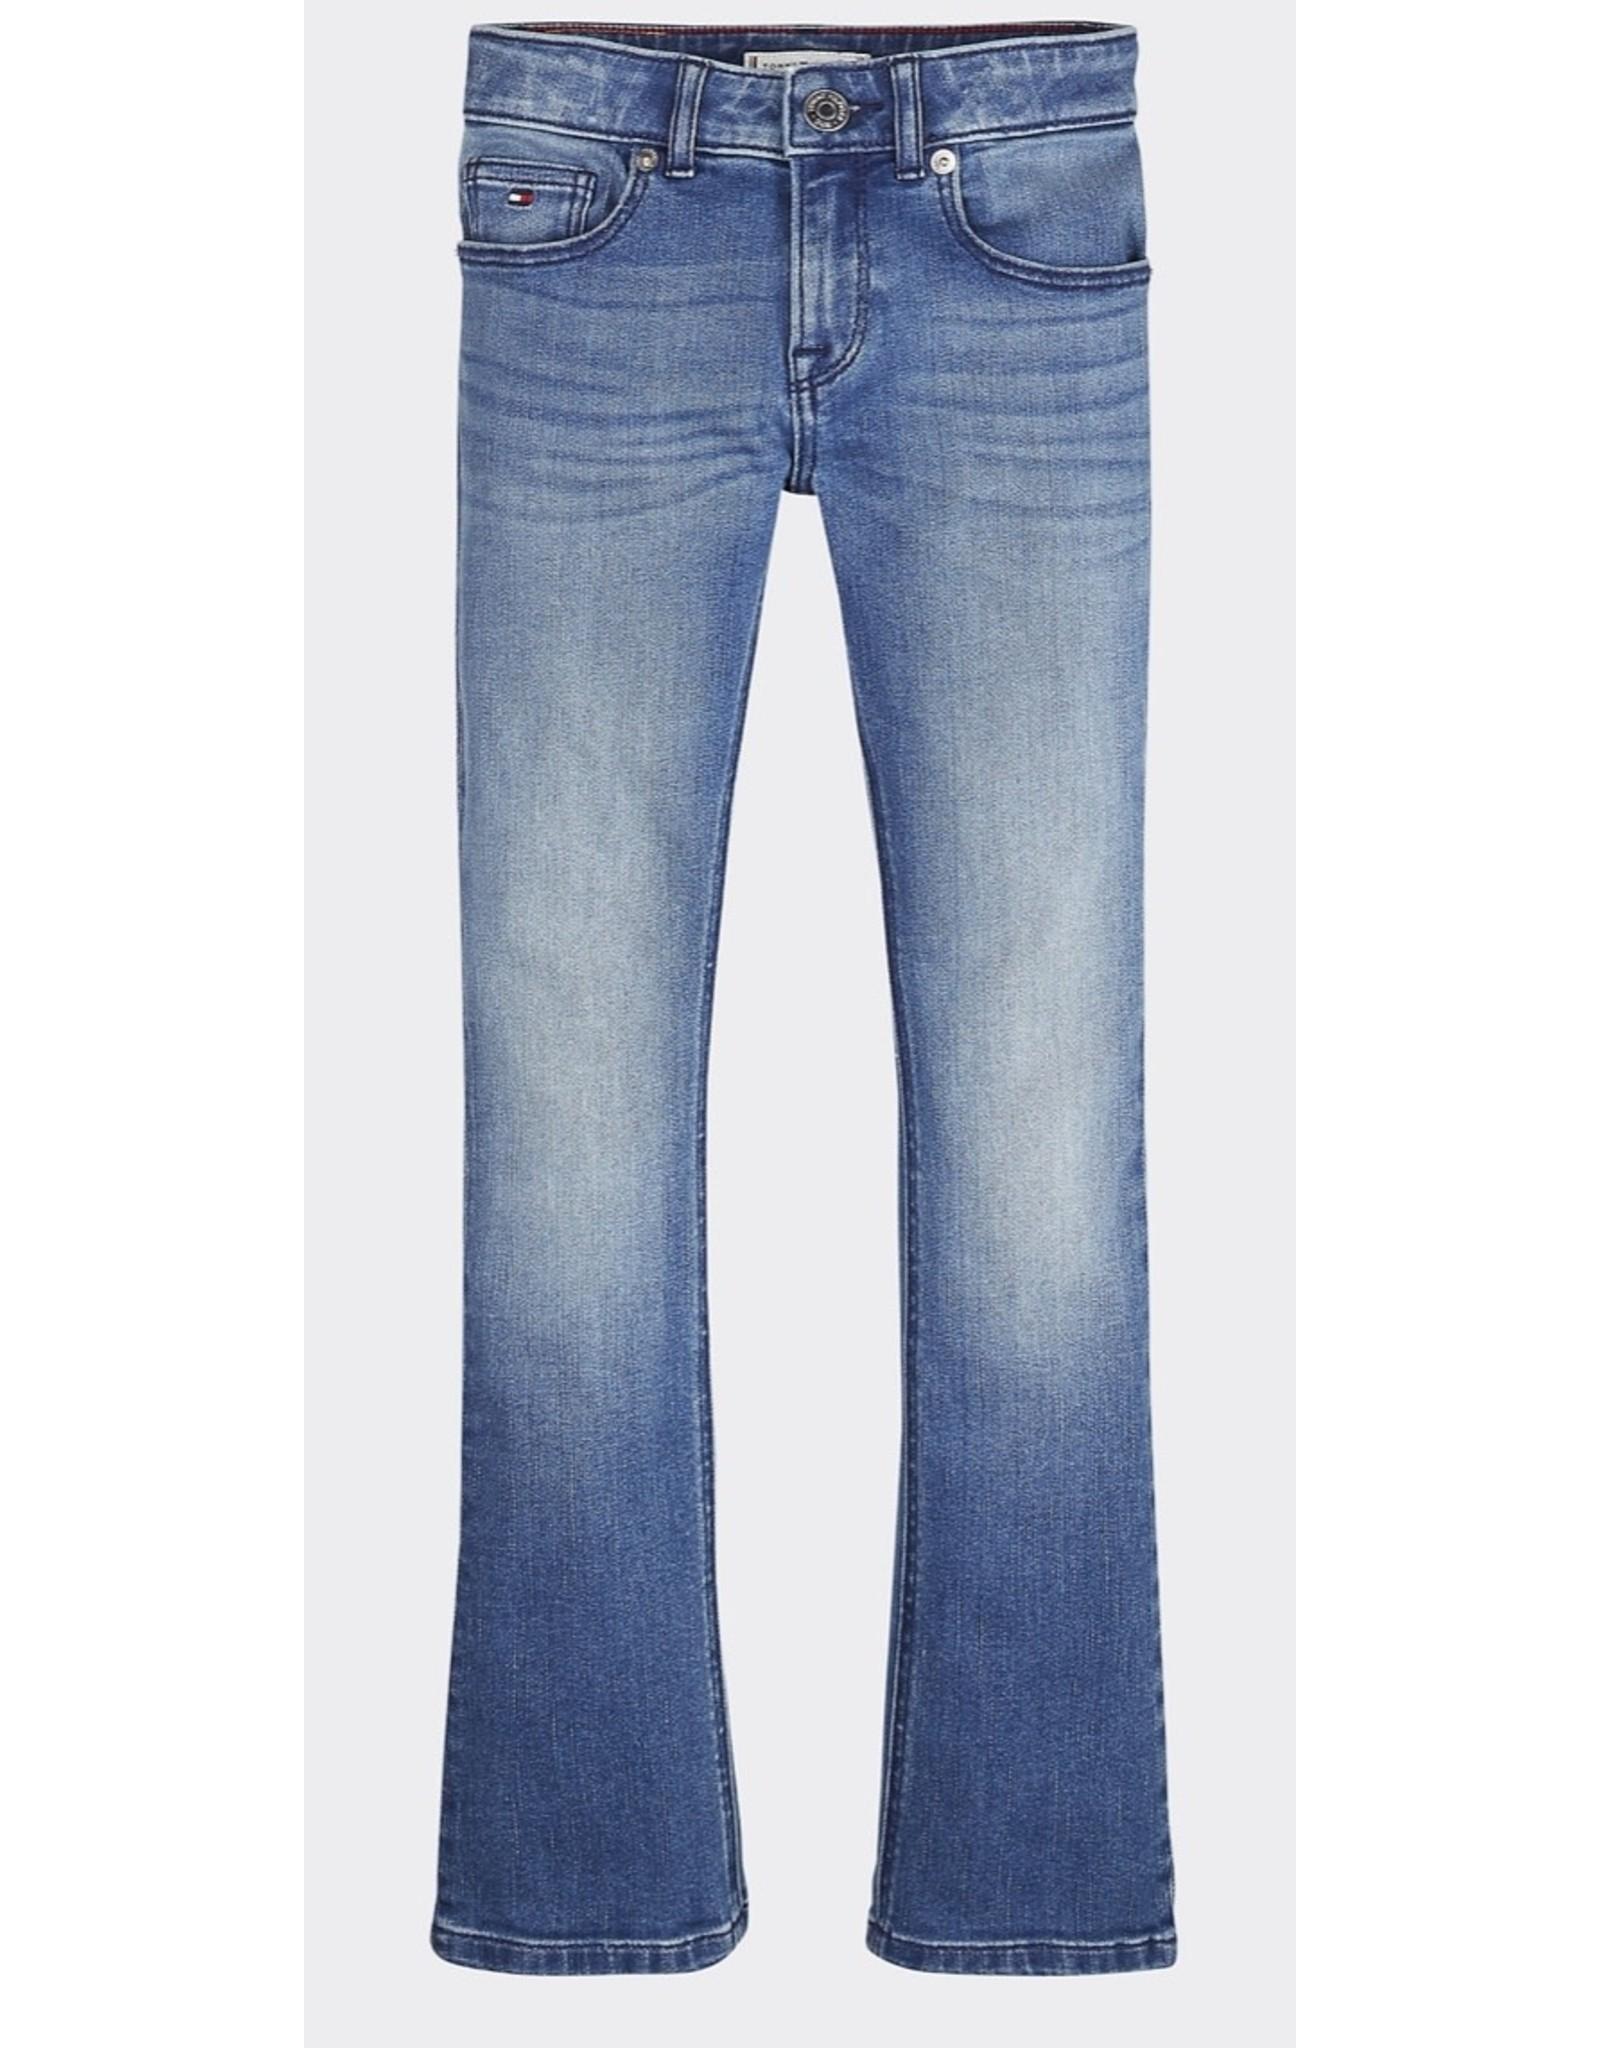 Tommy Hilfiger 4526 Jeans